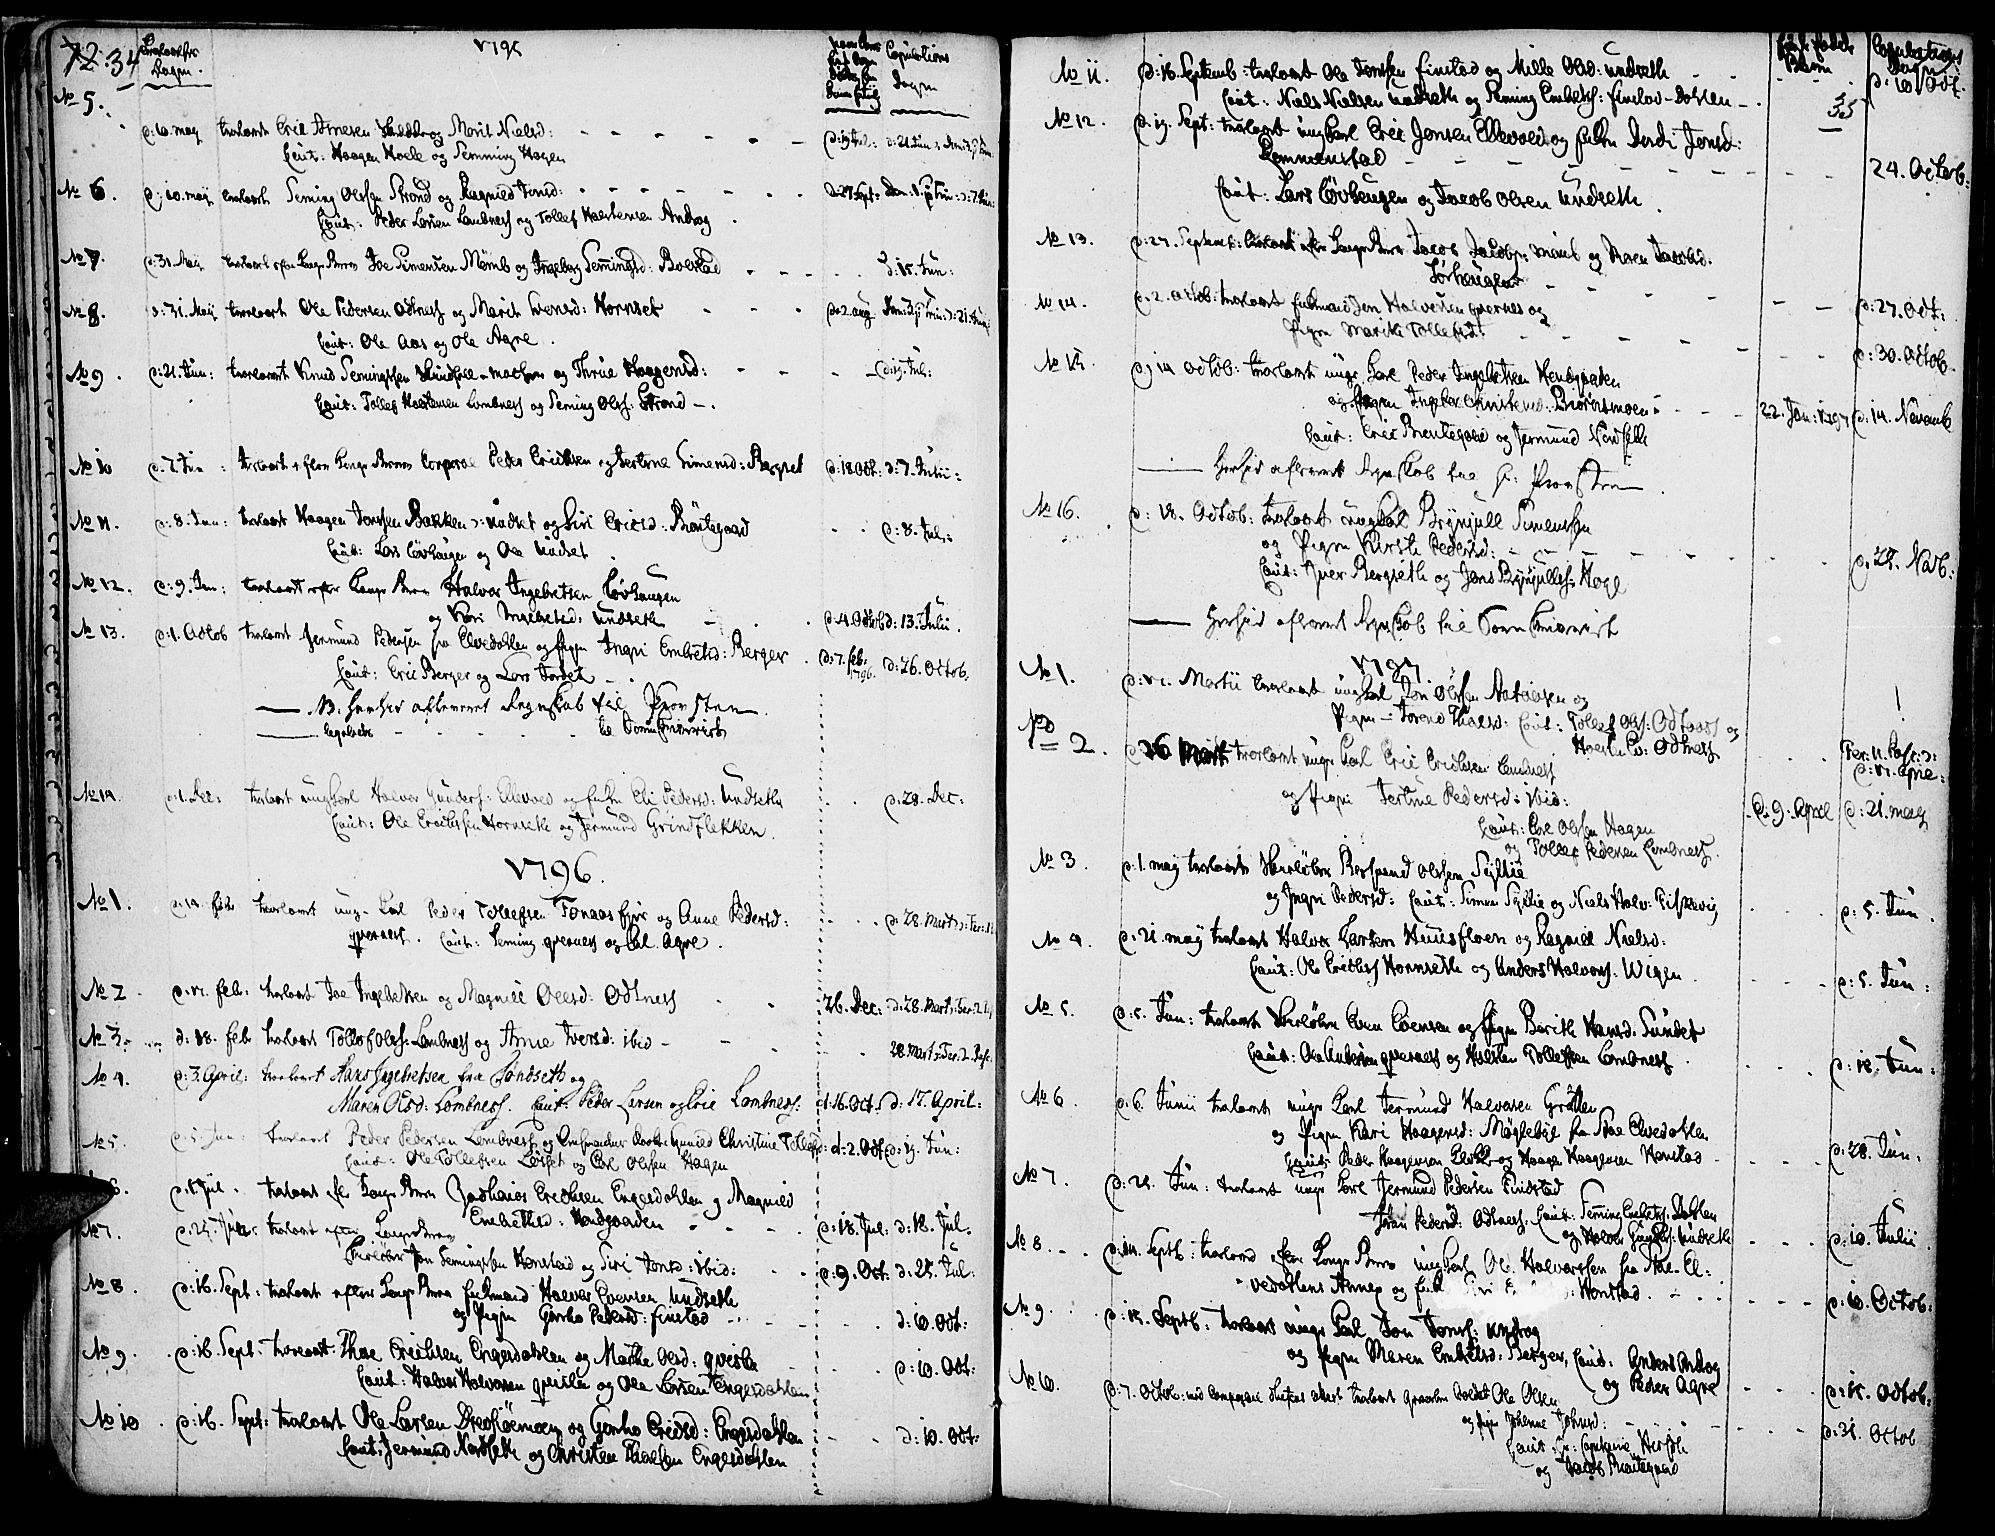 SAH, Rendalen prestekontor, H/Ha/Haa/L0002: Ministerialbok nr. 2, 1788-1814, s. 34-35